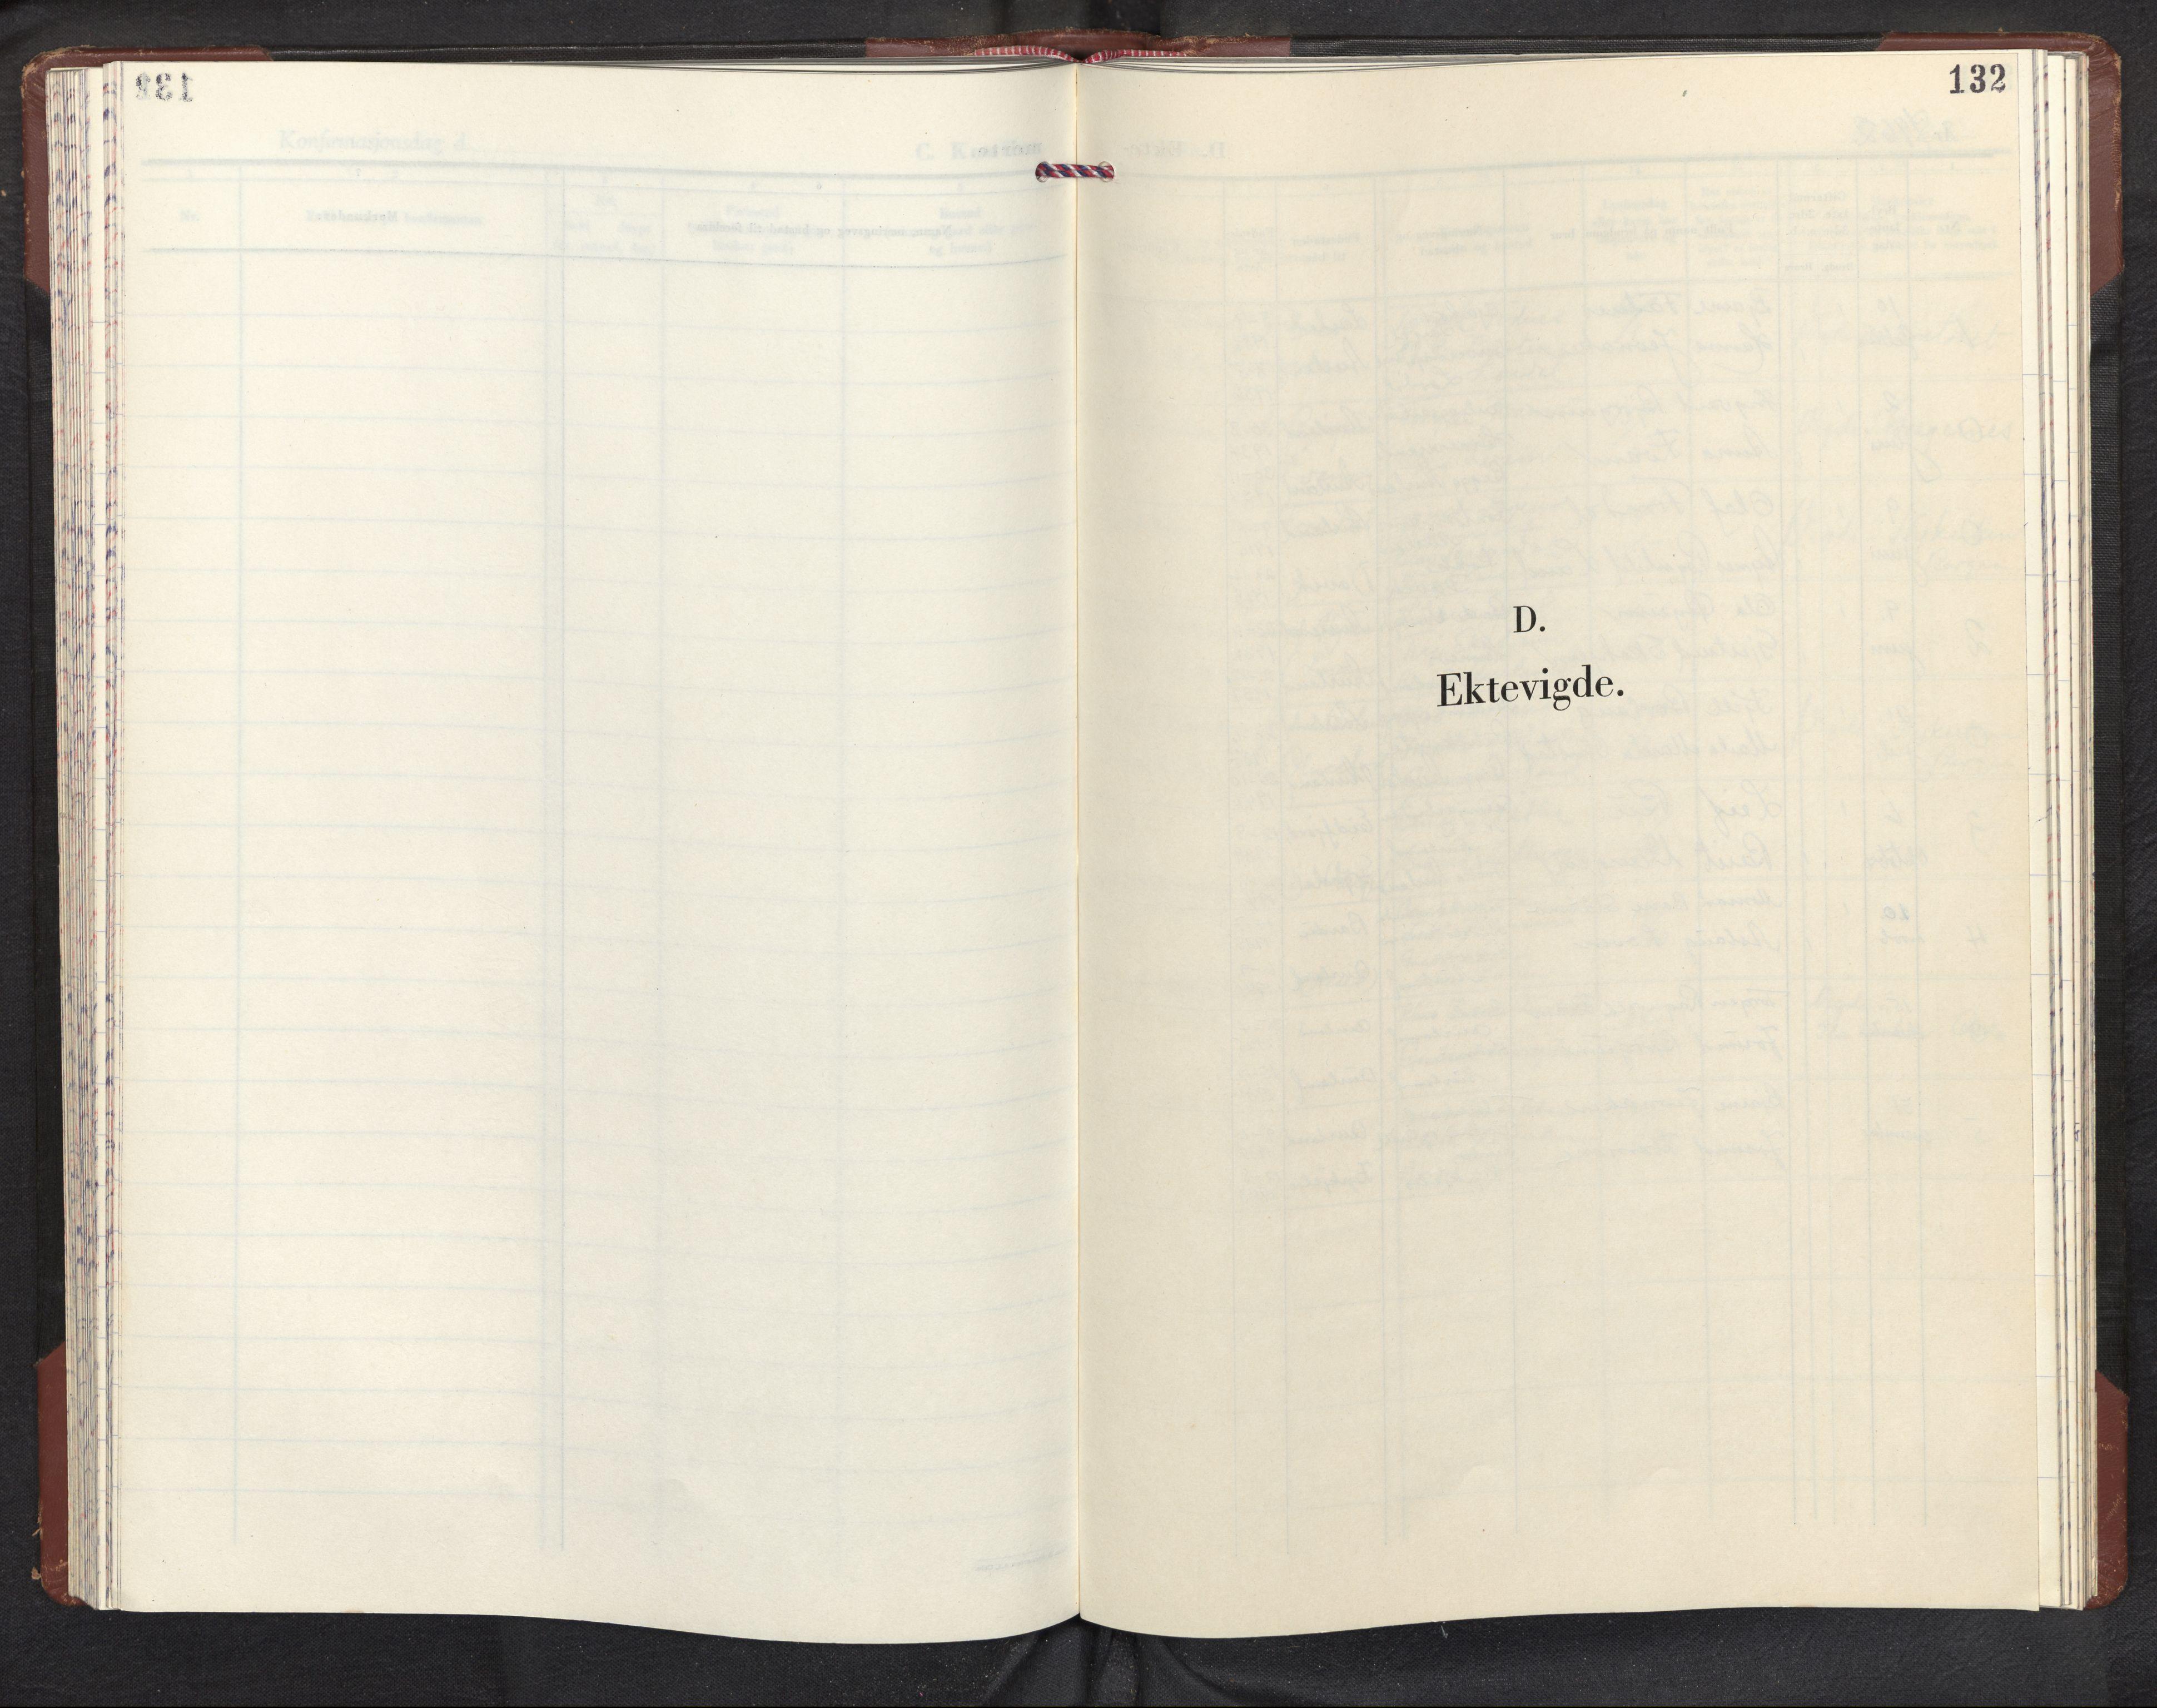 SAB, Aurland sokneprestembete, H/Hb/Hba/L0005: Klokkerbok nr. A 5, 1962-1980, s. 131b-132a